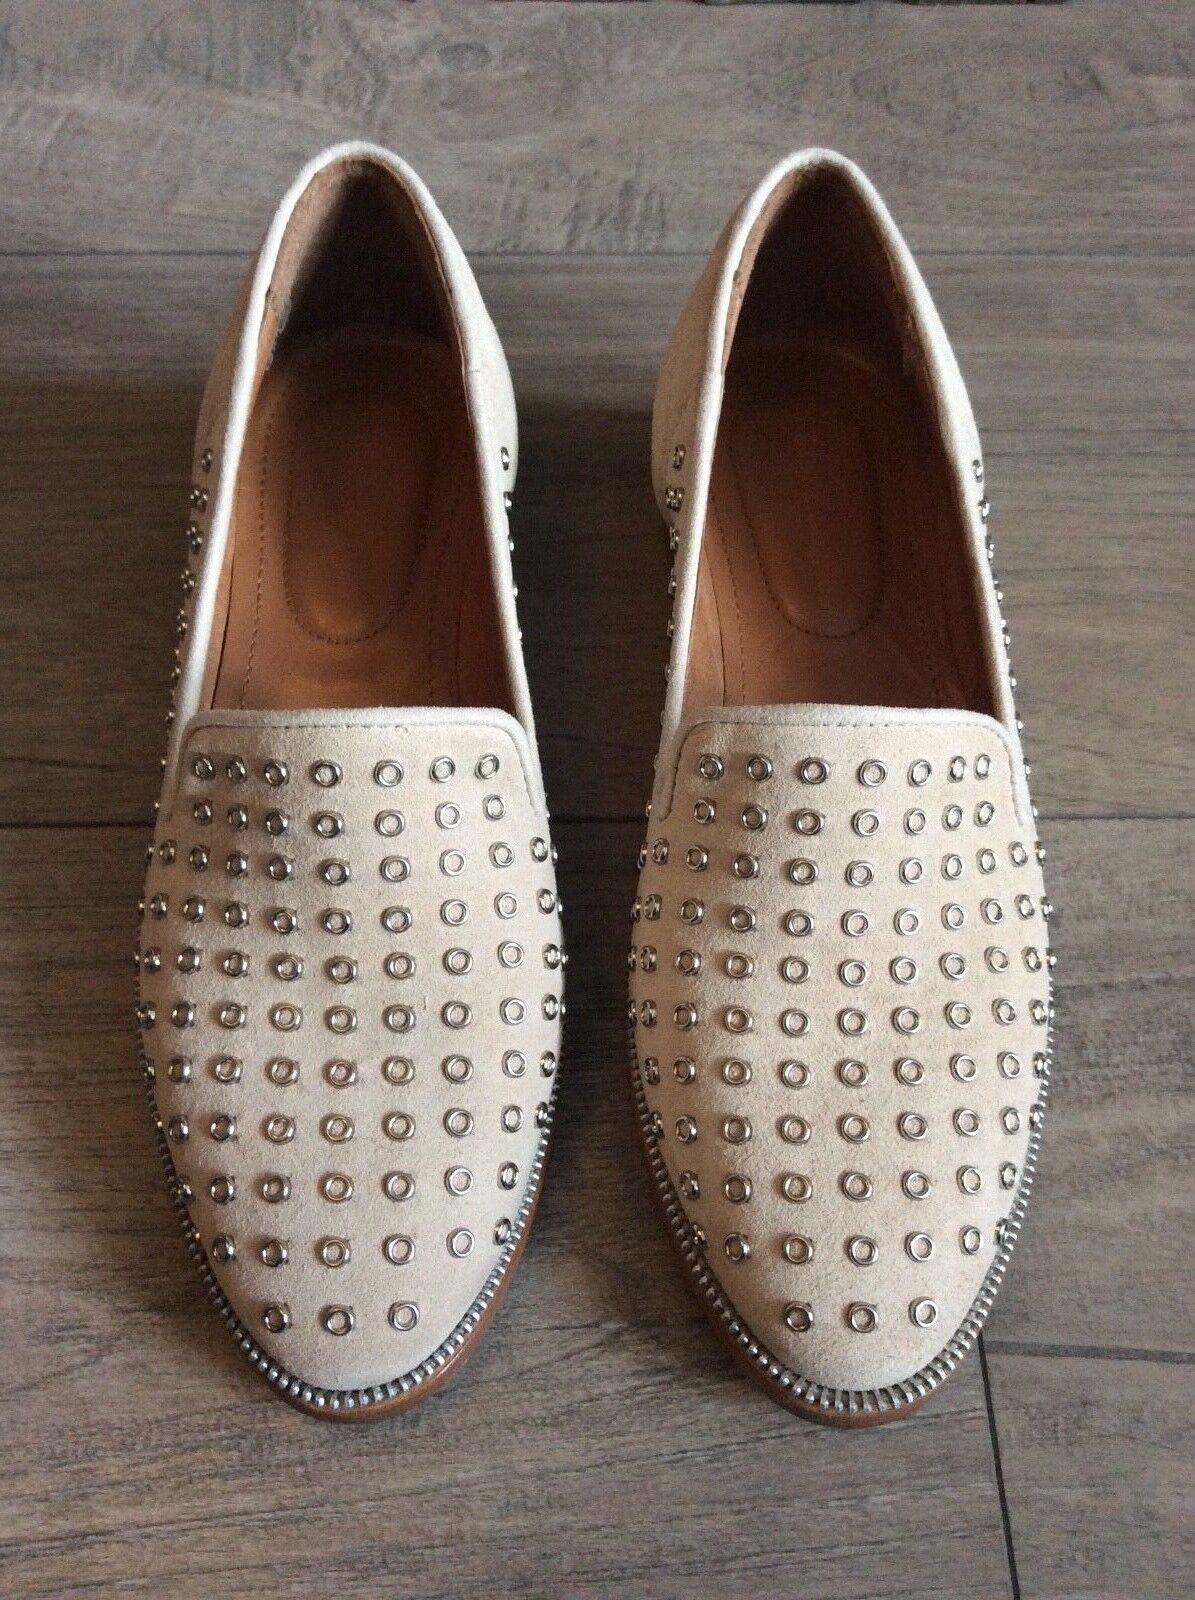 100% Authentic Kooples Ladies Suede Flat shoes shoes shoes ad7a28